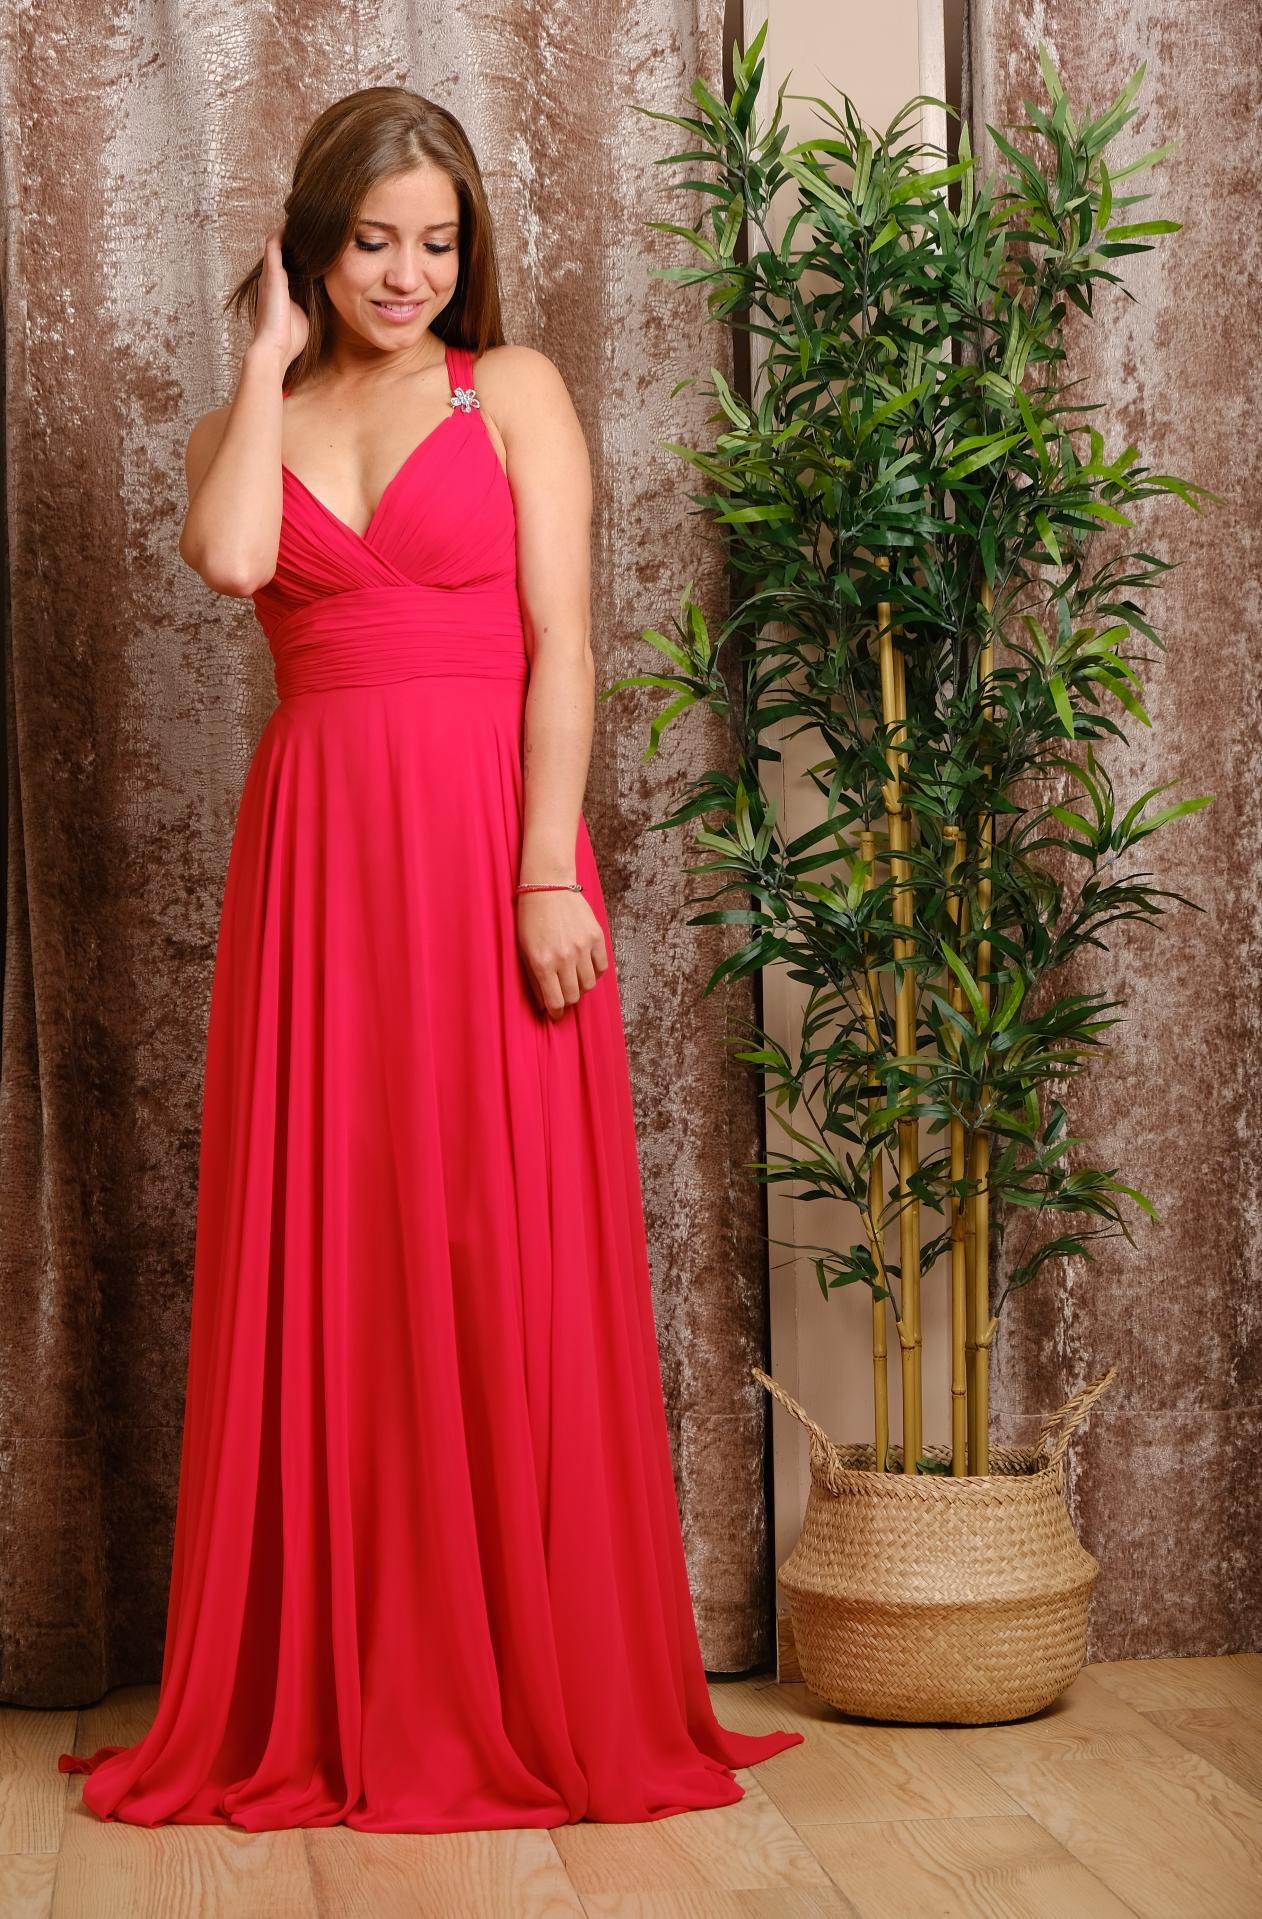 Vestido de fiesta largo.  Rojo Valentino.